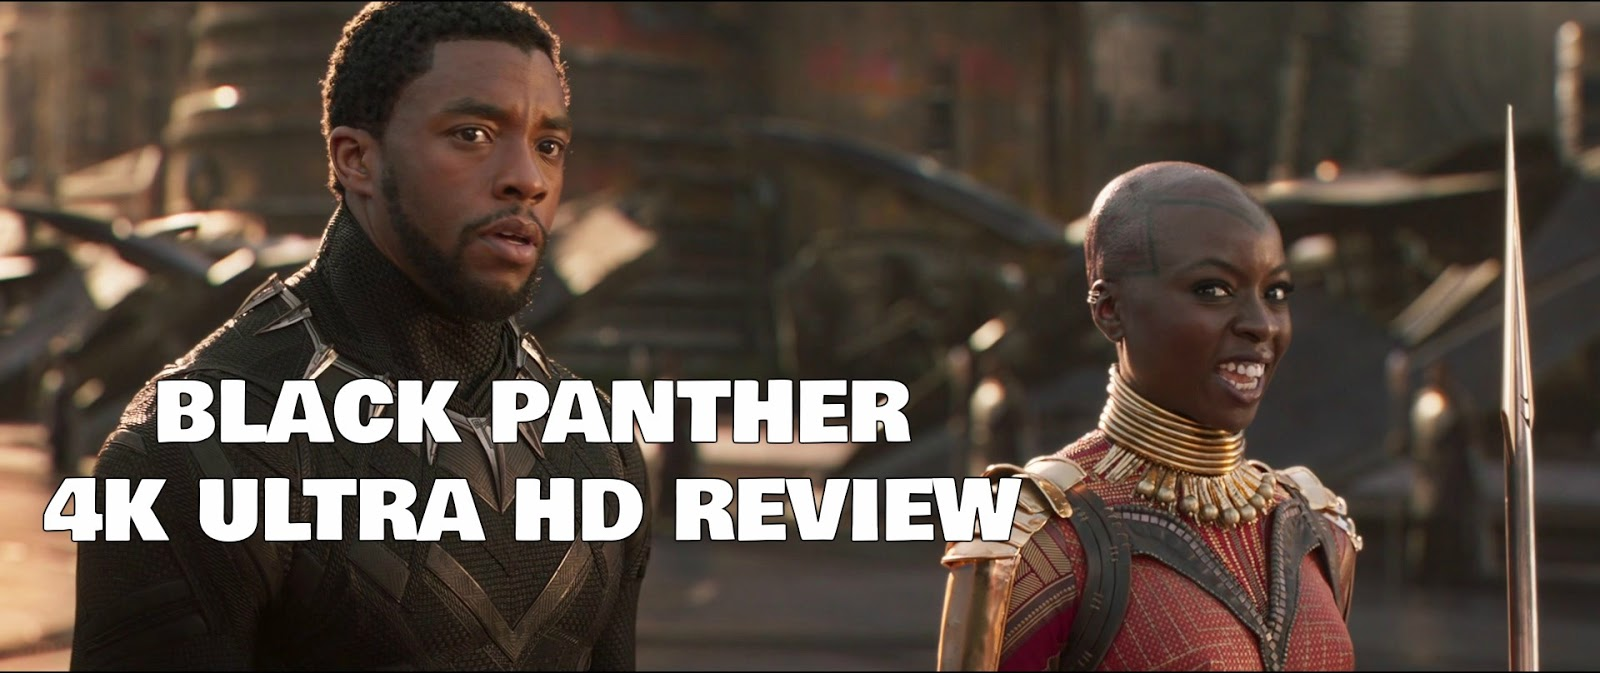 Black Panther 4K Ultra HD Blu-ray Ultra HD Review